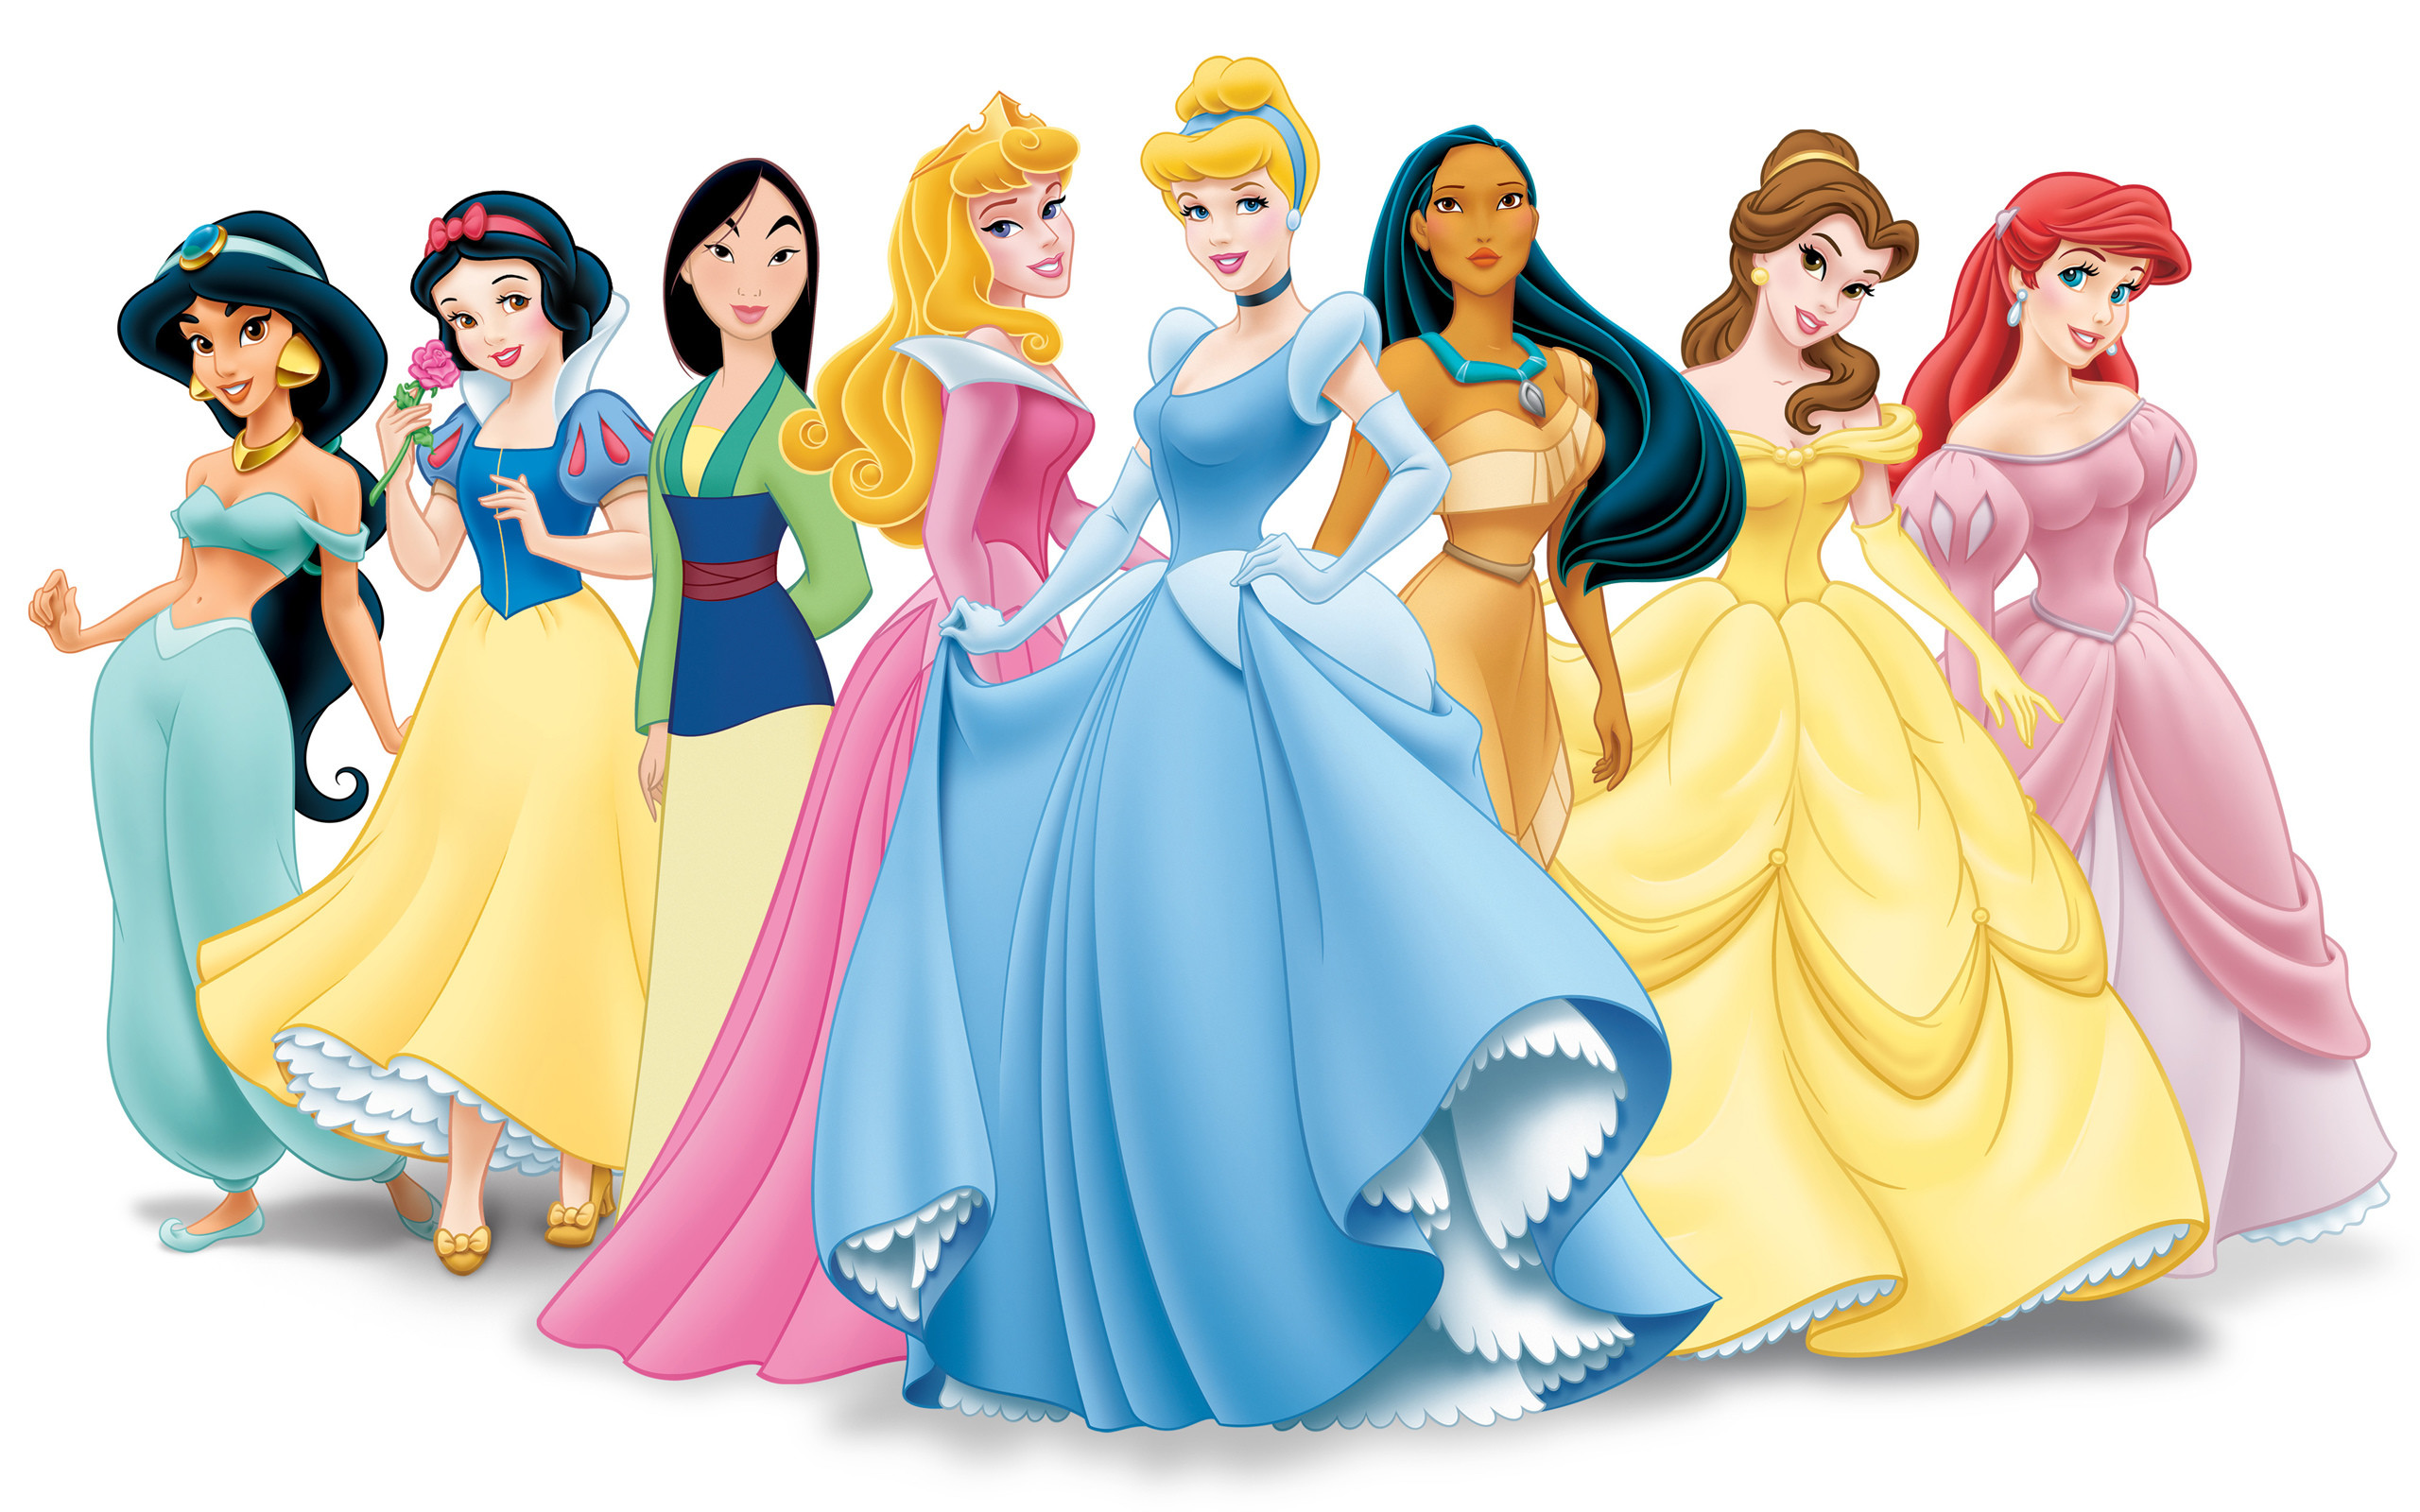 Disney Princess Wallpaper Images 66 Images